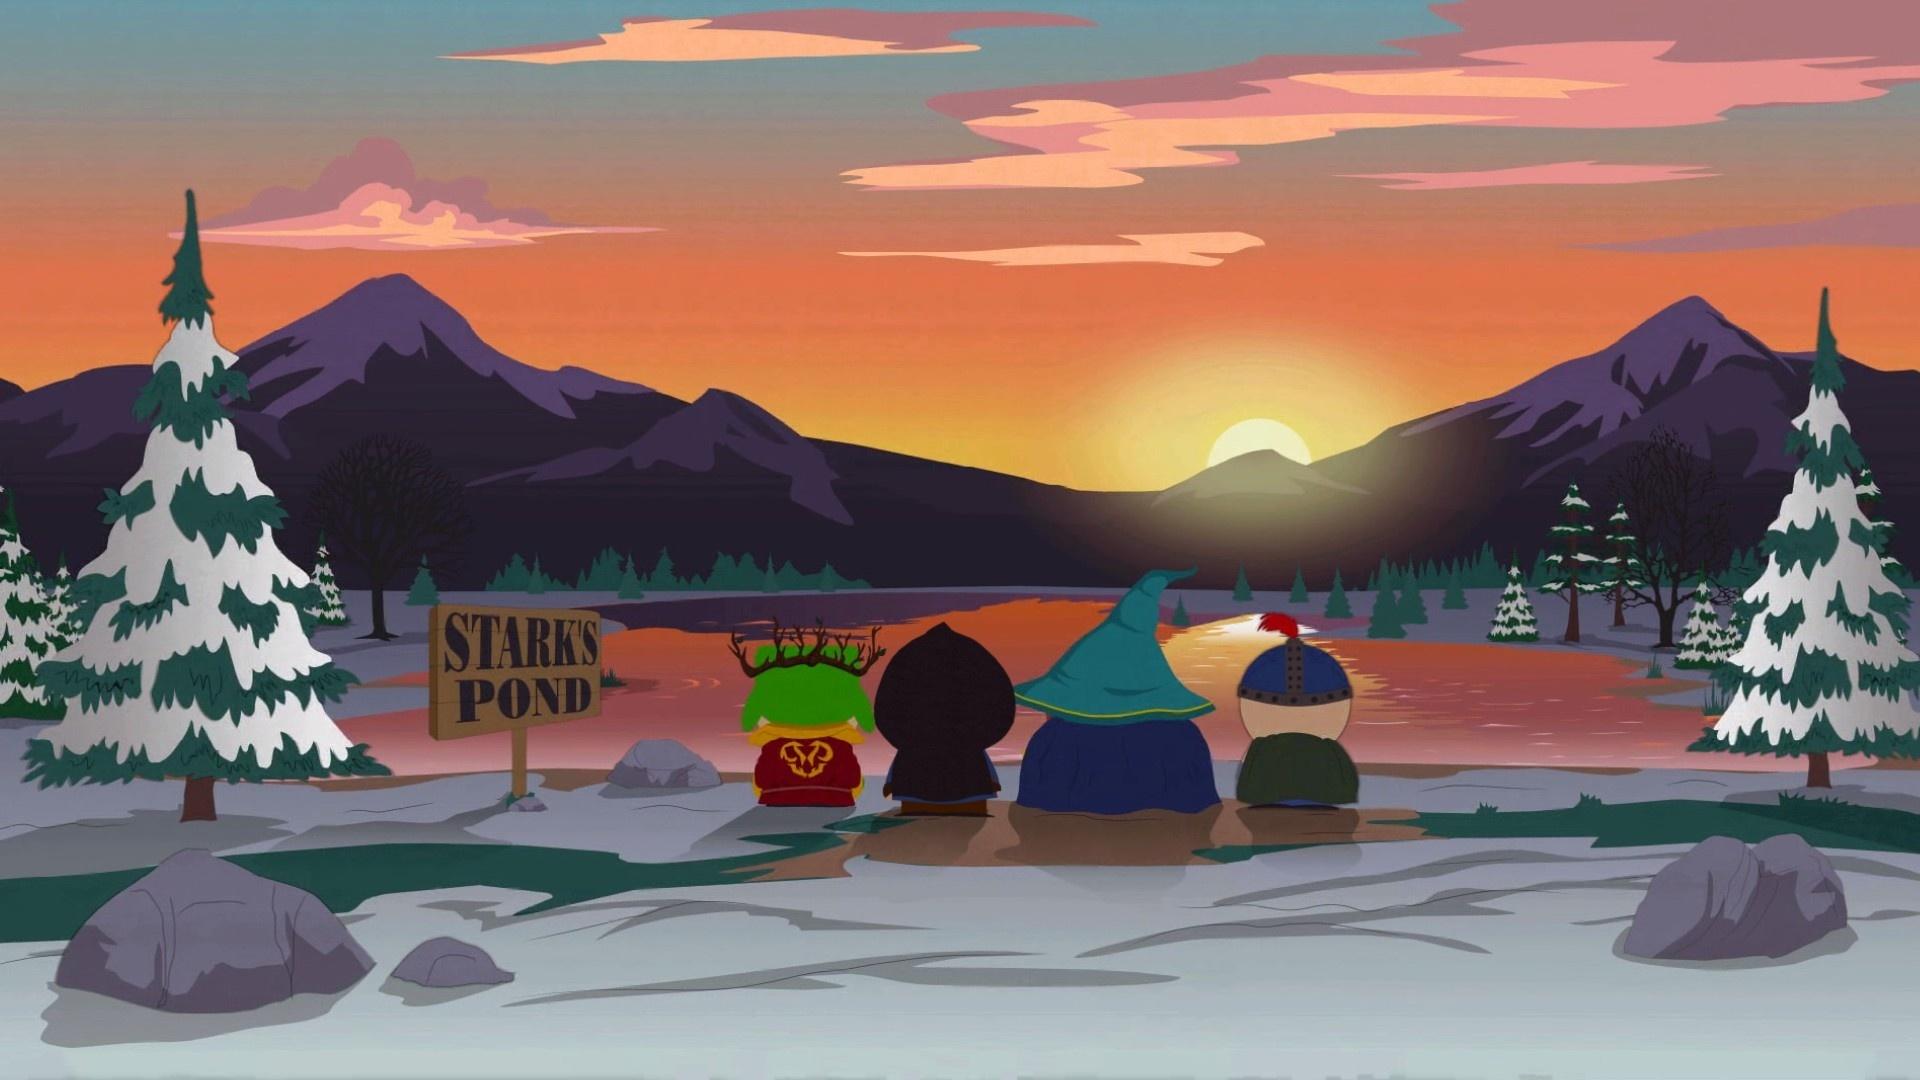 South Park background wallpaper